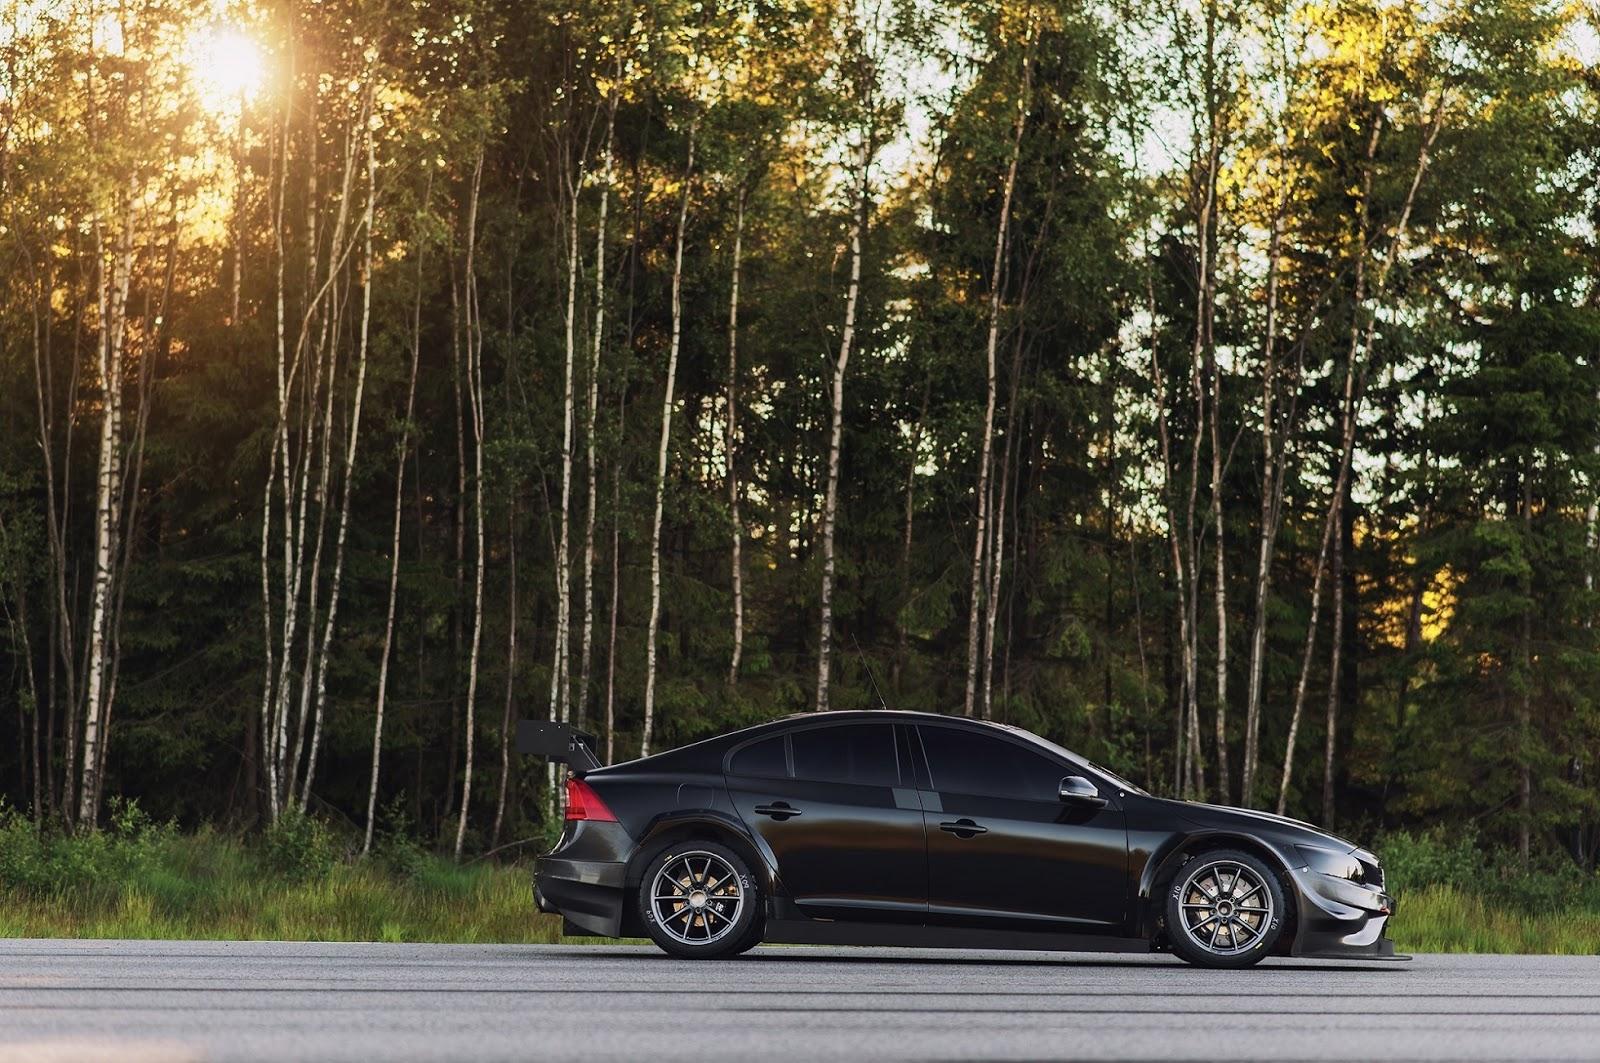 VOLVO POLESTAR%2BCYAN%2BRACING%2BIN%2BWTCC%2BWITH%2BS60%2BPOLESTAR 2 Η Volvo στο WTCC με το S60 Polestar για να γιορτάσει το ένδοξο παρελθόν του Volvo 240 Turbo